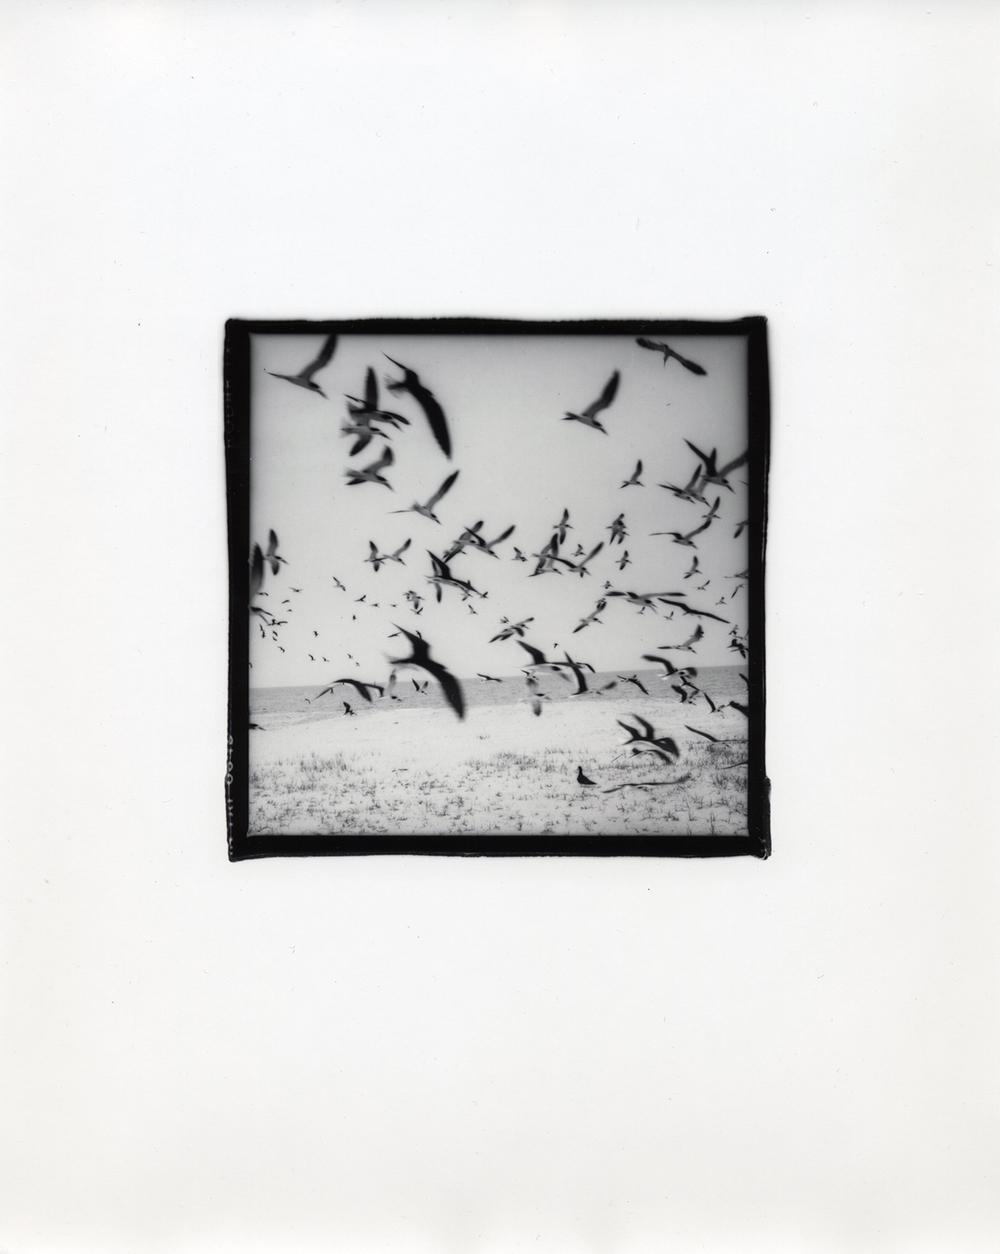 "Biloxi, Mississippi, 1988. Selenium toned silver gelatin print. Ed. of 25. 4.25""x4.25"" image on 8""x10"" paper."